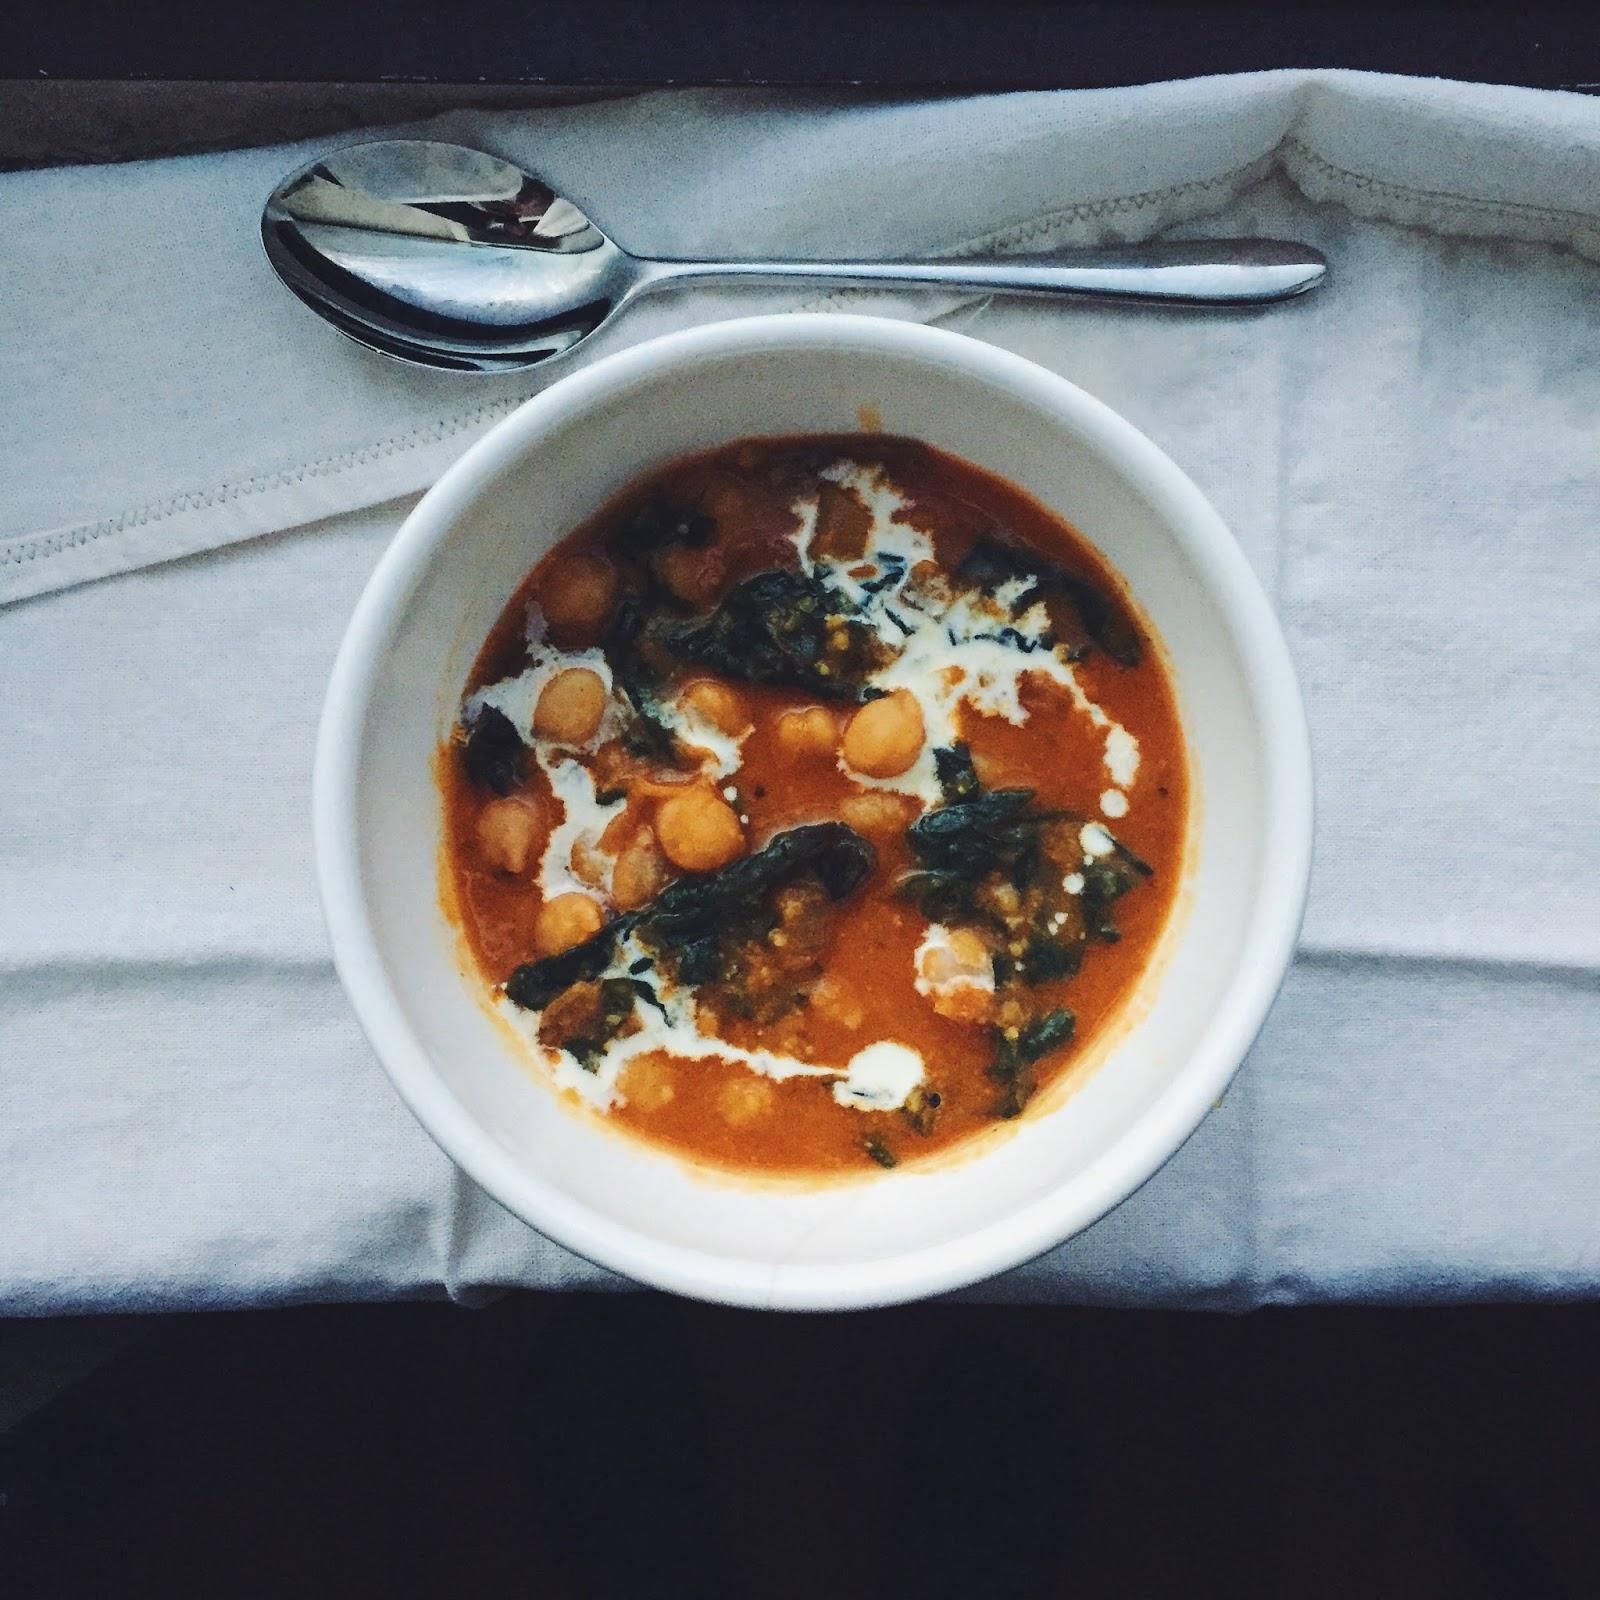 amour fou(d): chickpea stew with tomato, tumeric, yogurt ...